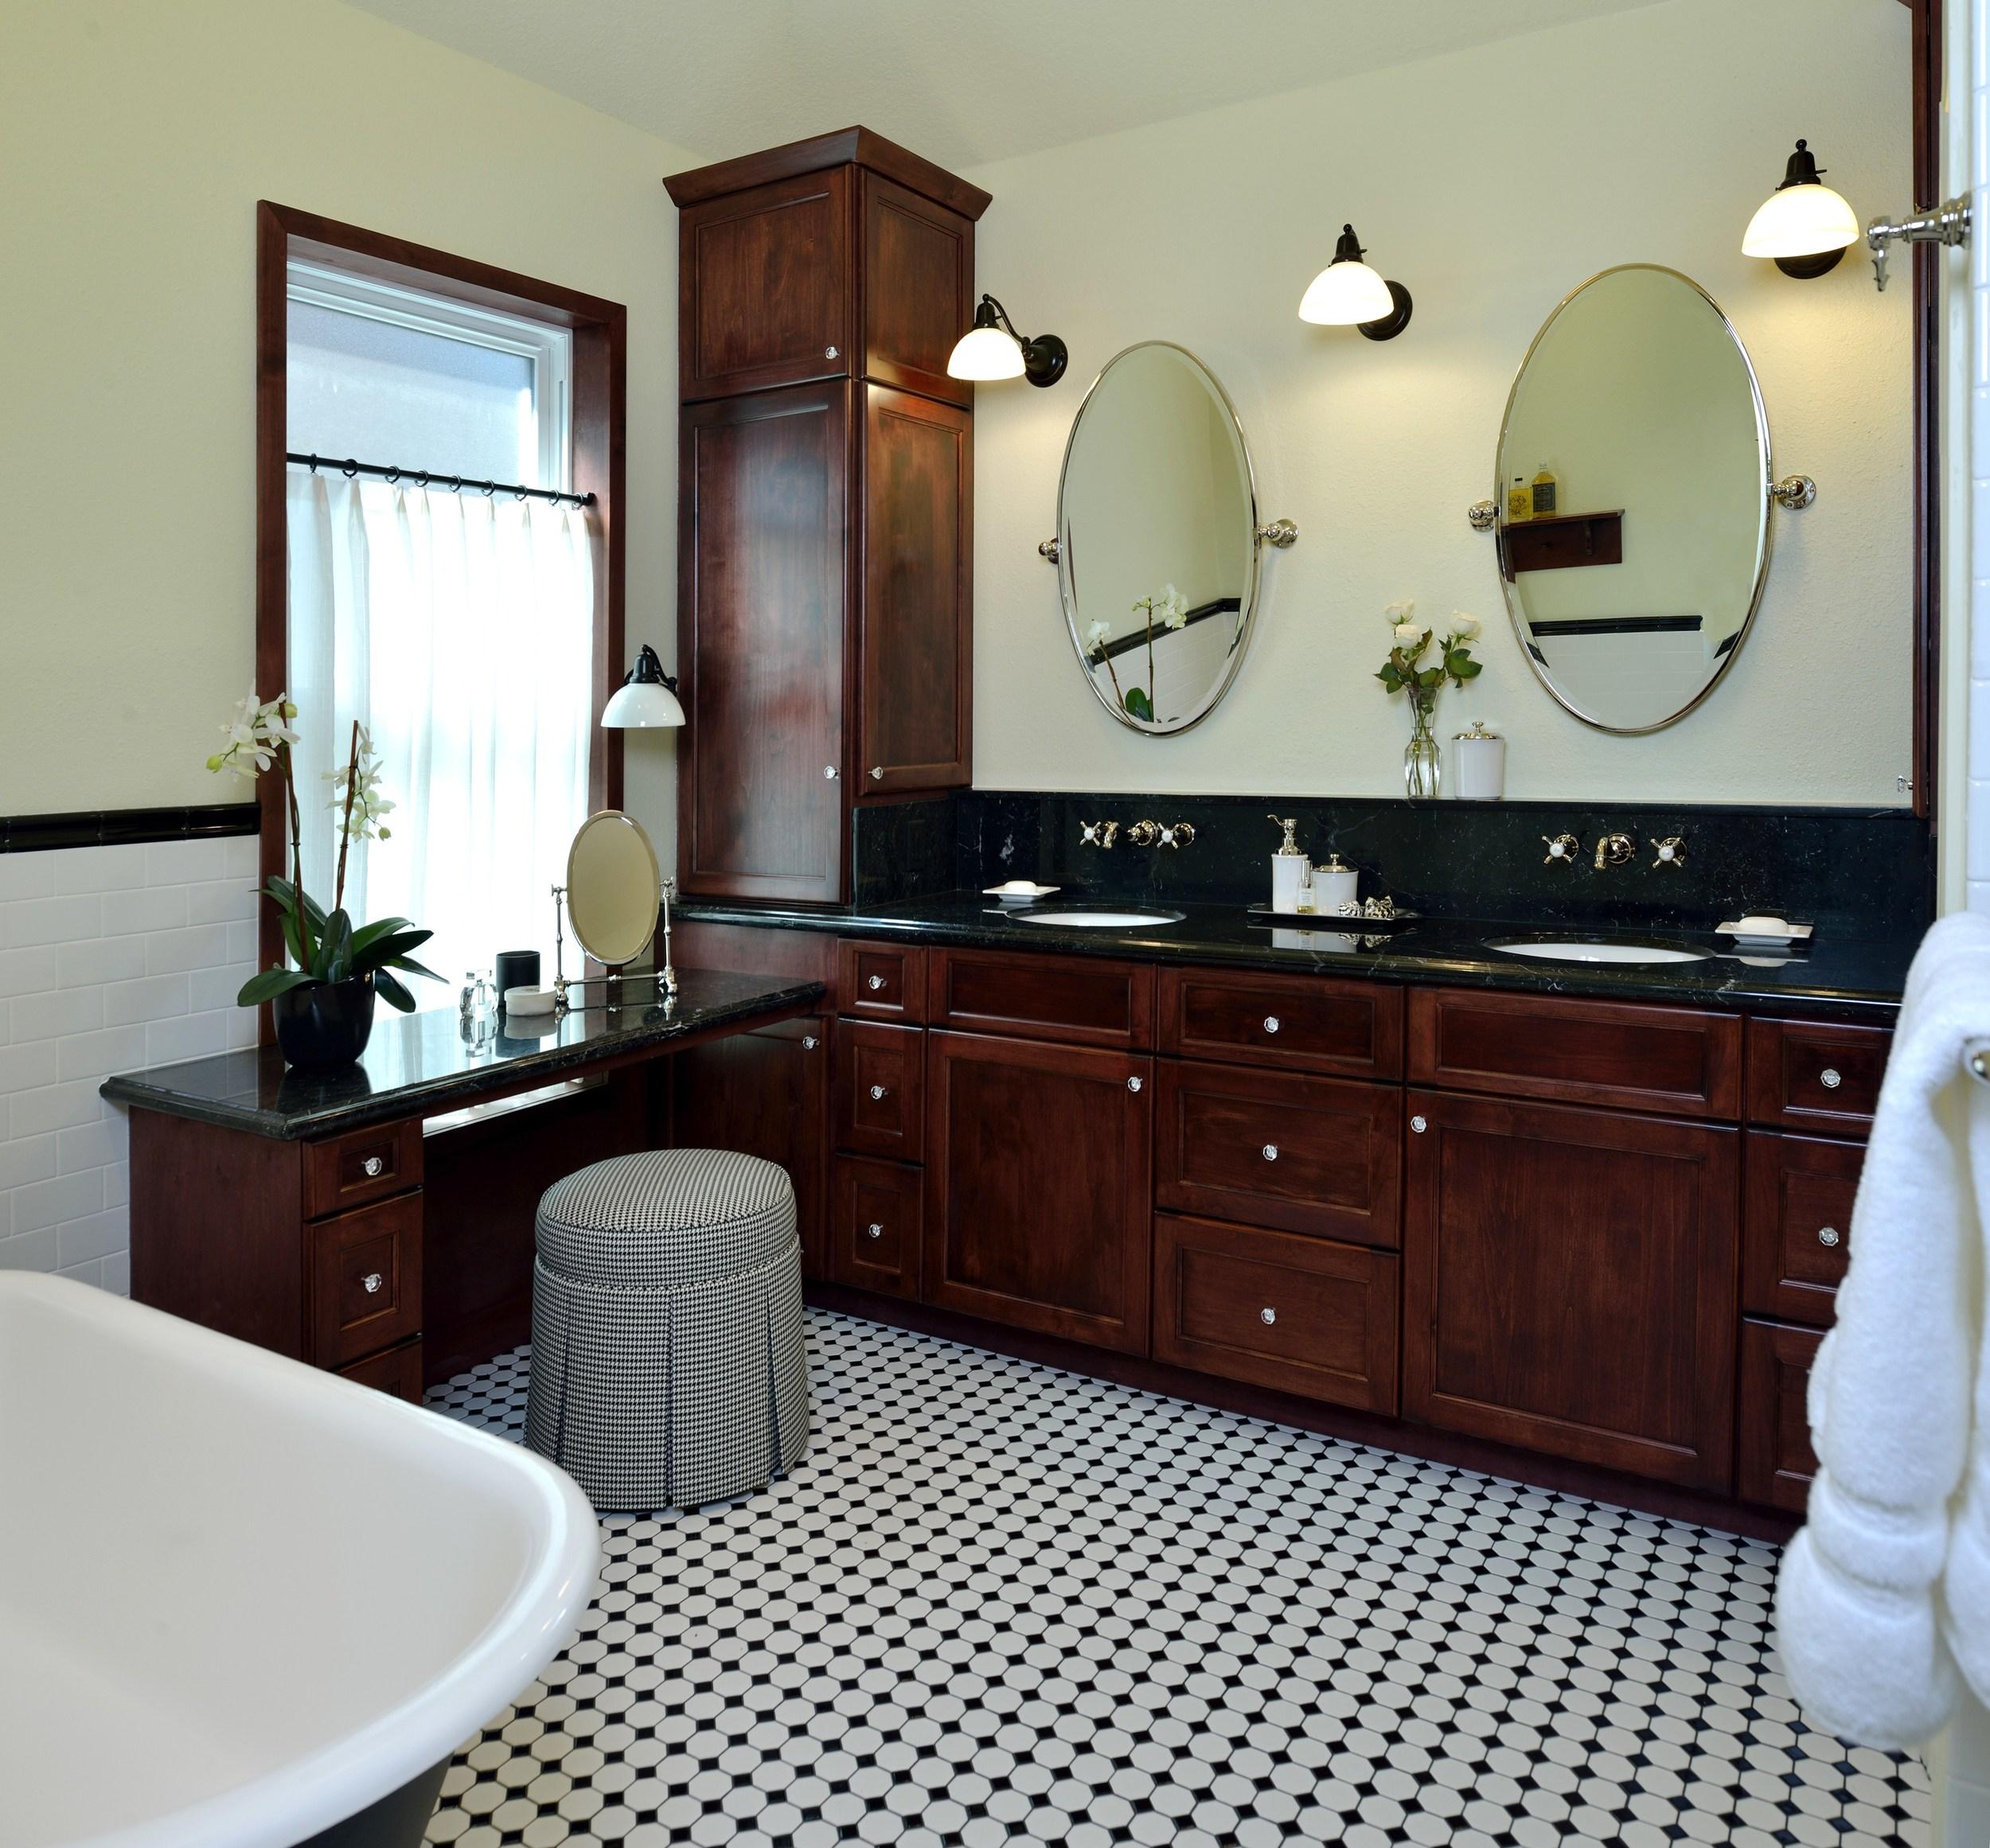 Vintage-inspired master bathroom| Interior Designer: Carla Aston / Photographer: Miro Dvorscak / black and white tile, black marble, cafe curtain, houndstooth, tilt mirrors, claw foot tub